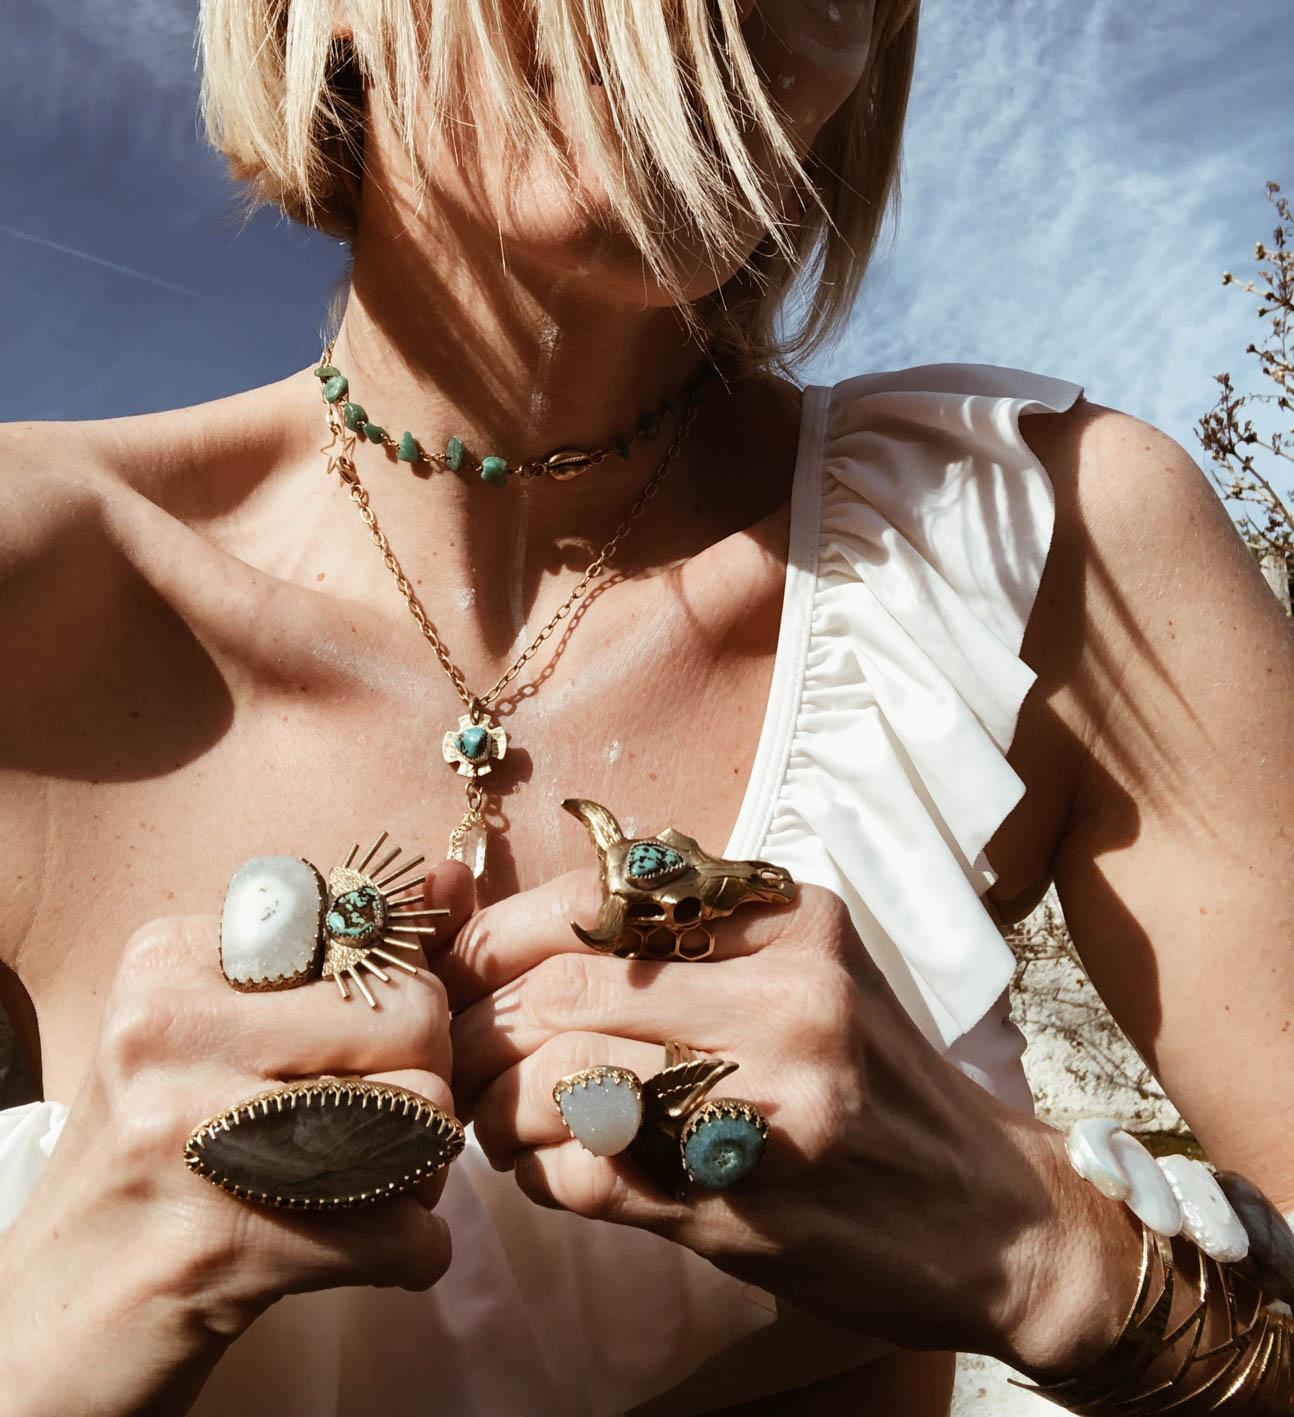 Carnet sauvage- blog mode et tendances - christina rose jewelry18.jpg